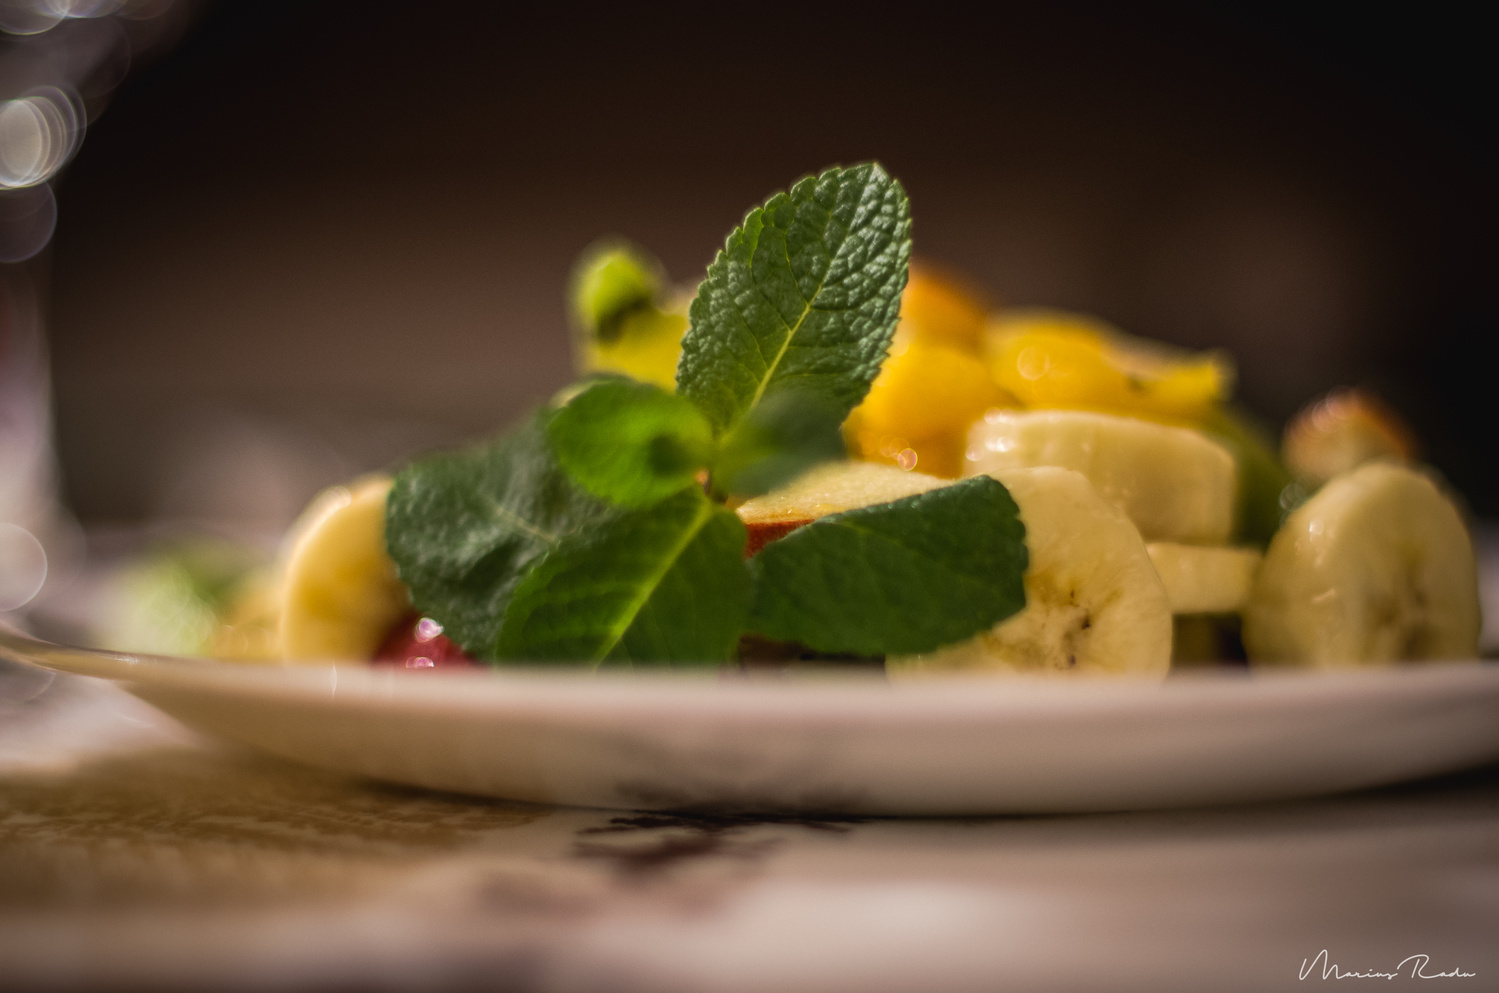 Fruit salad by Marius Radu